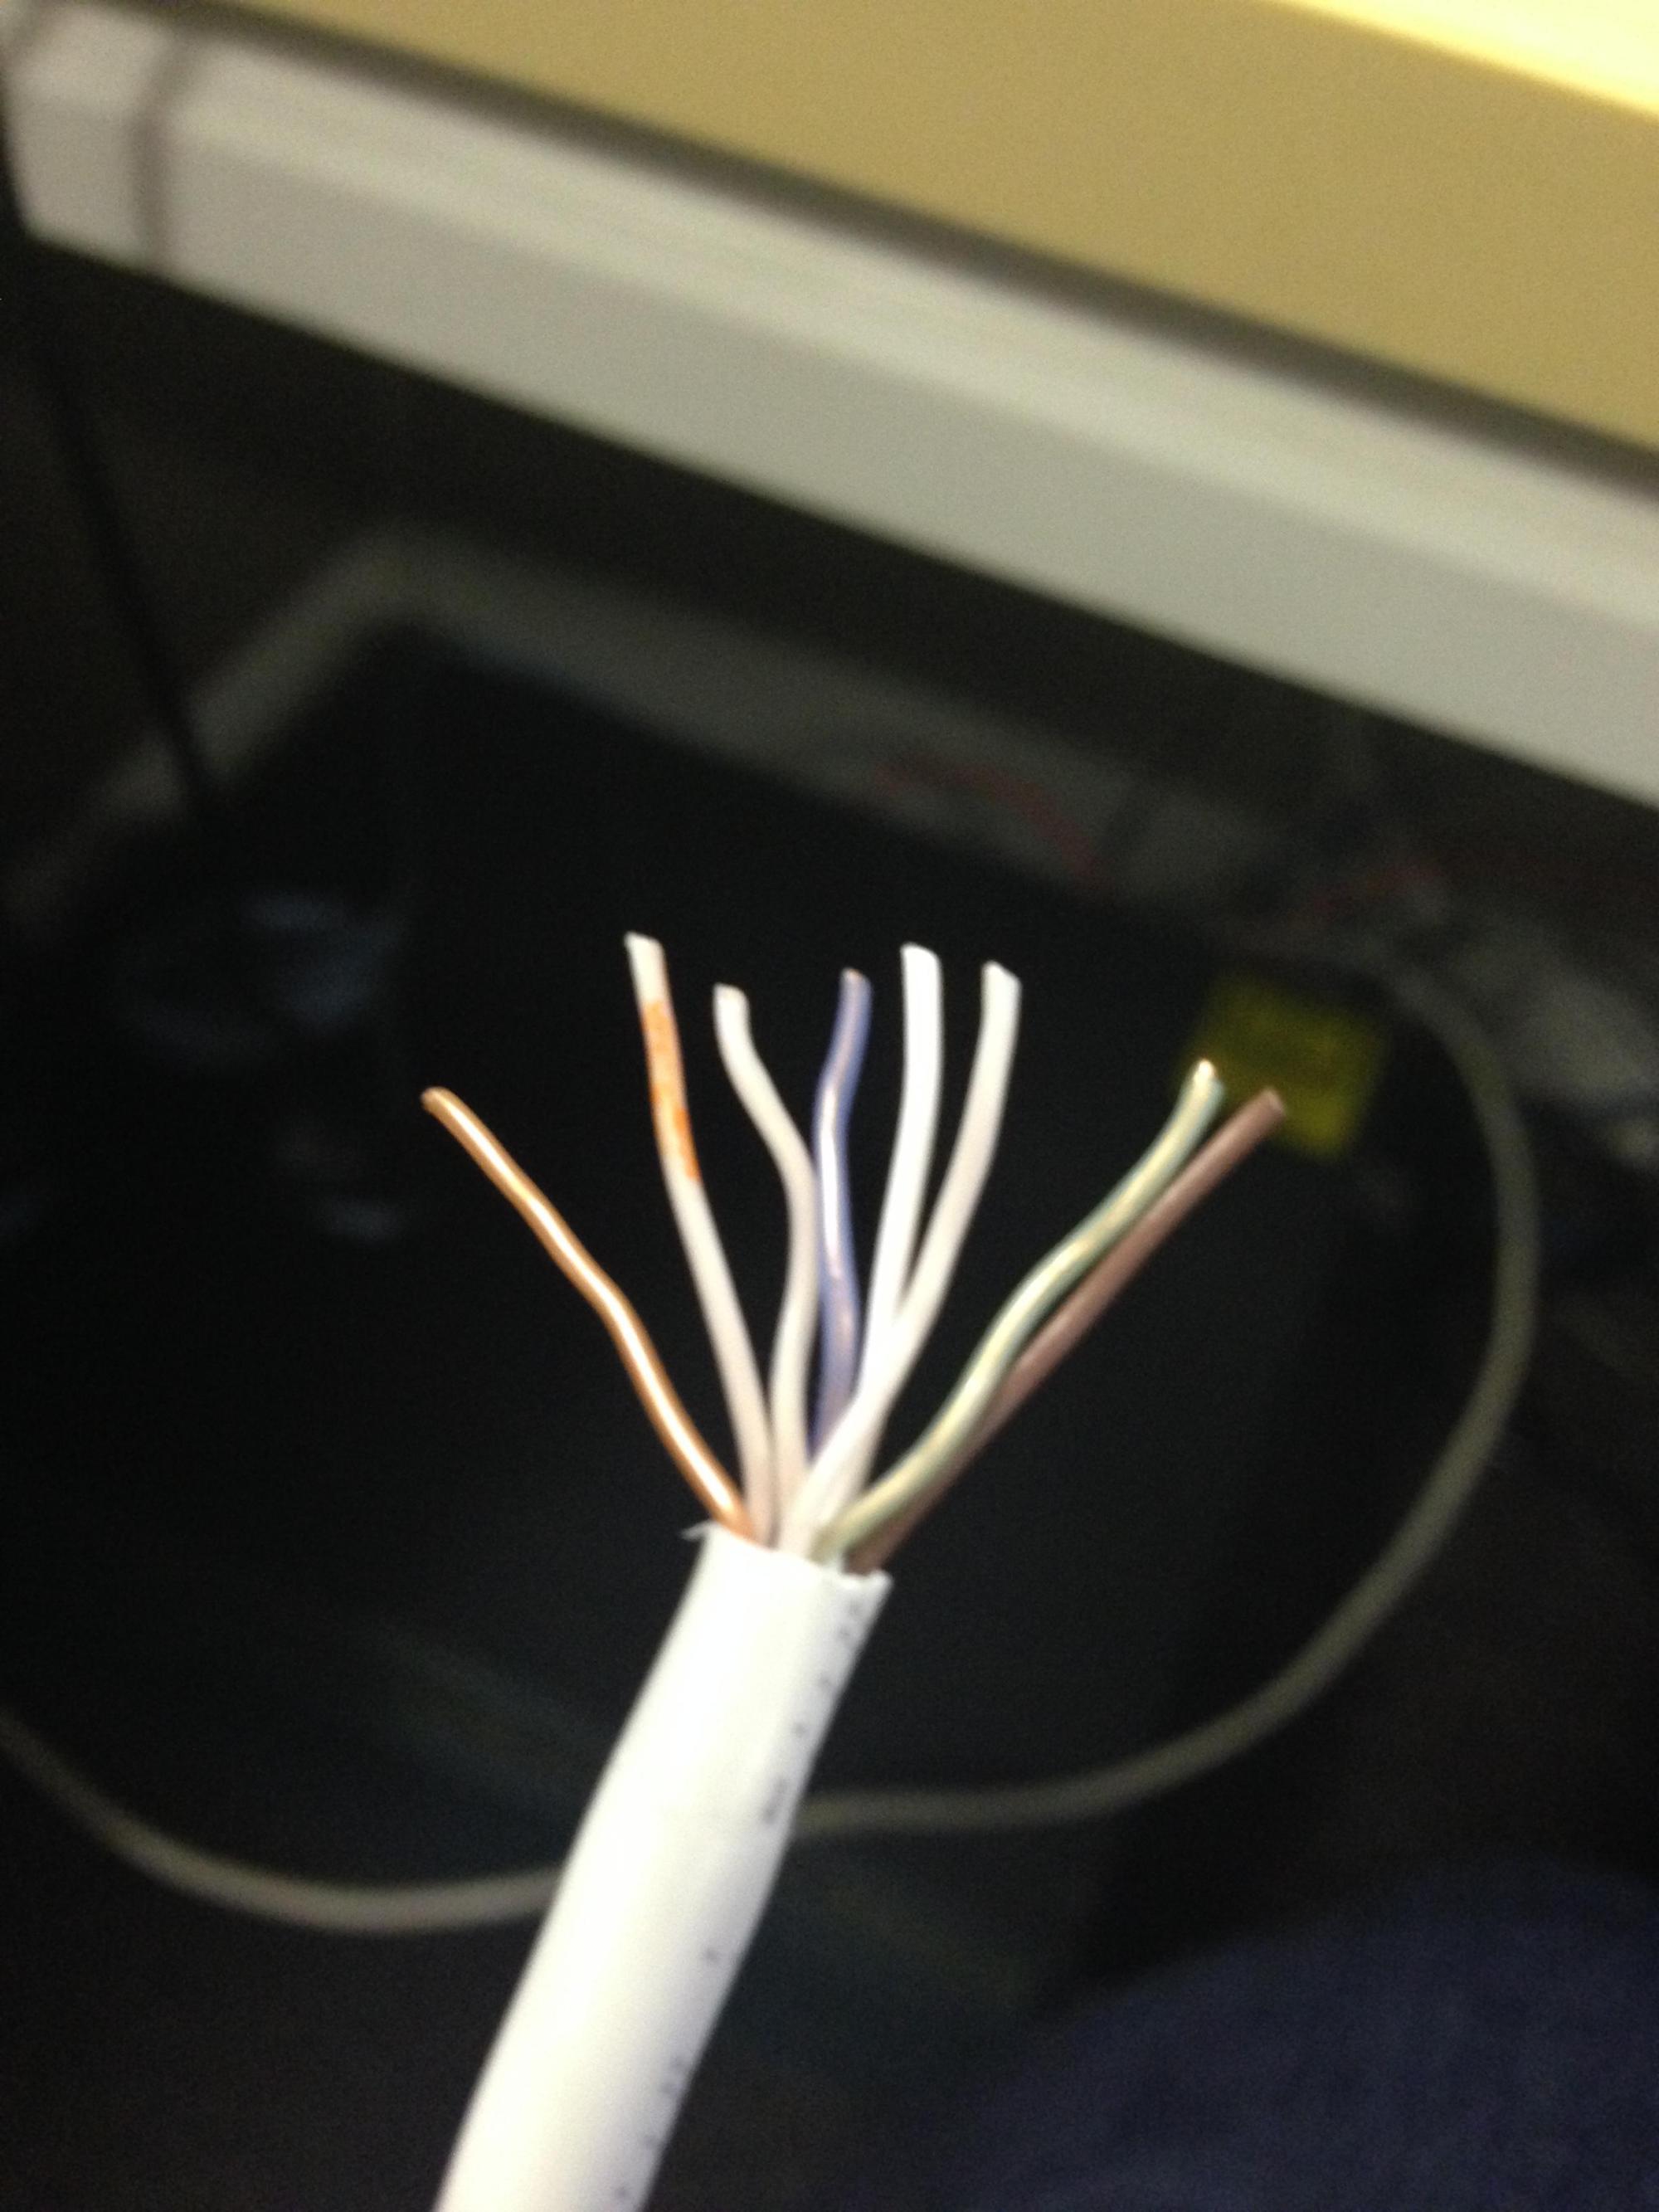 hight resolution of  ethernet cables enter image description here